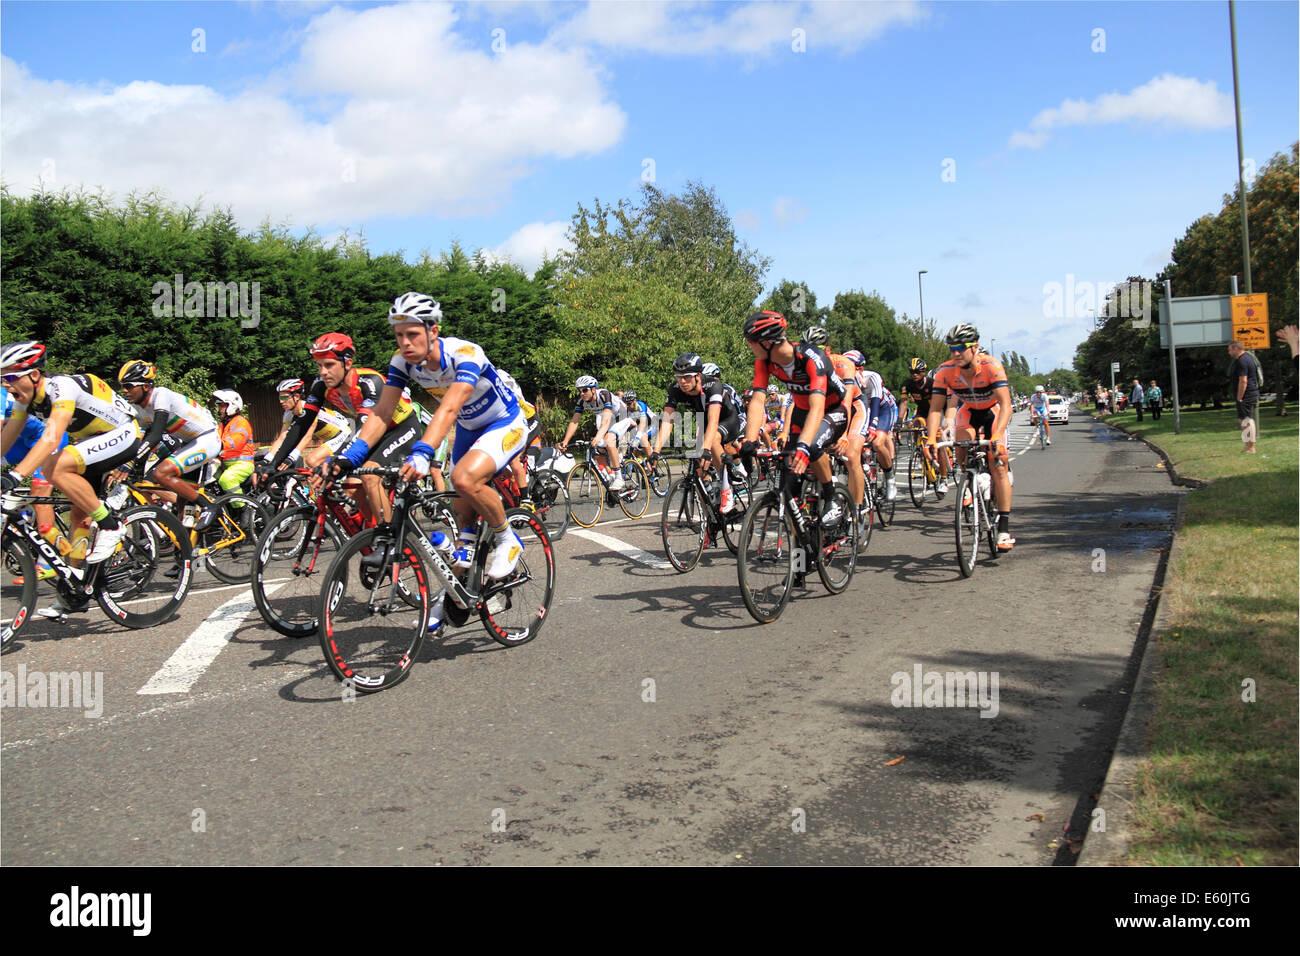 East Molesey, Surrey, UK. 10. August 2014. Aufsichtsrechtlichen RideLondon-Surrey Klassiker. Hauptfeld. 147 Radprofis Stockbild